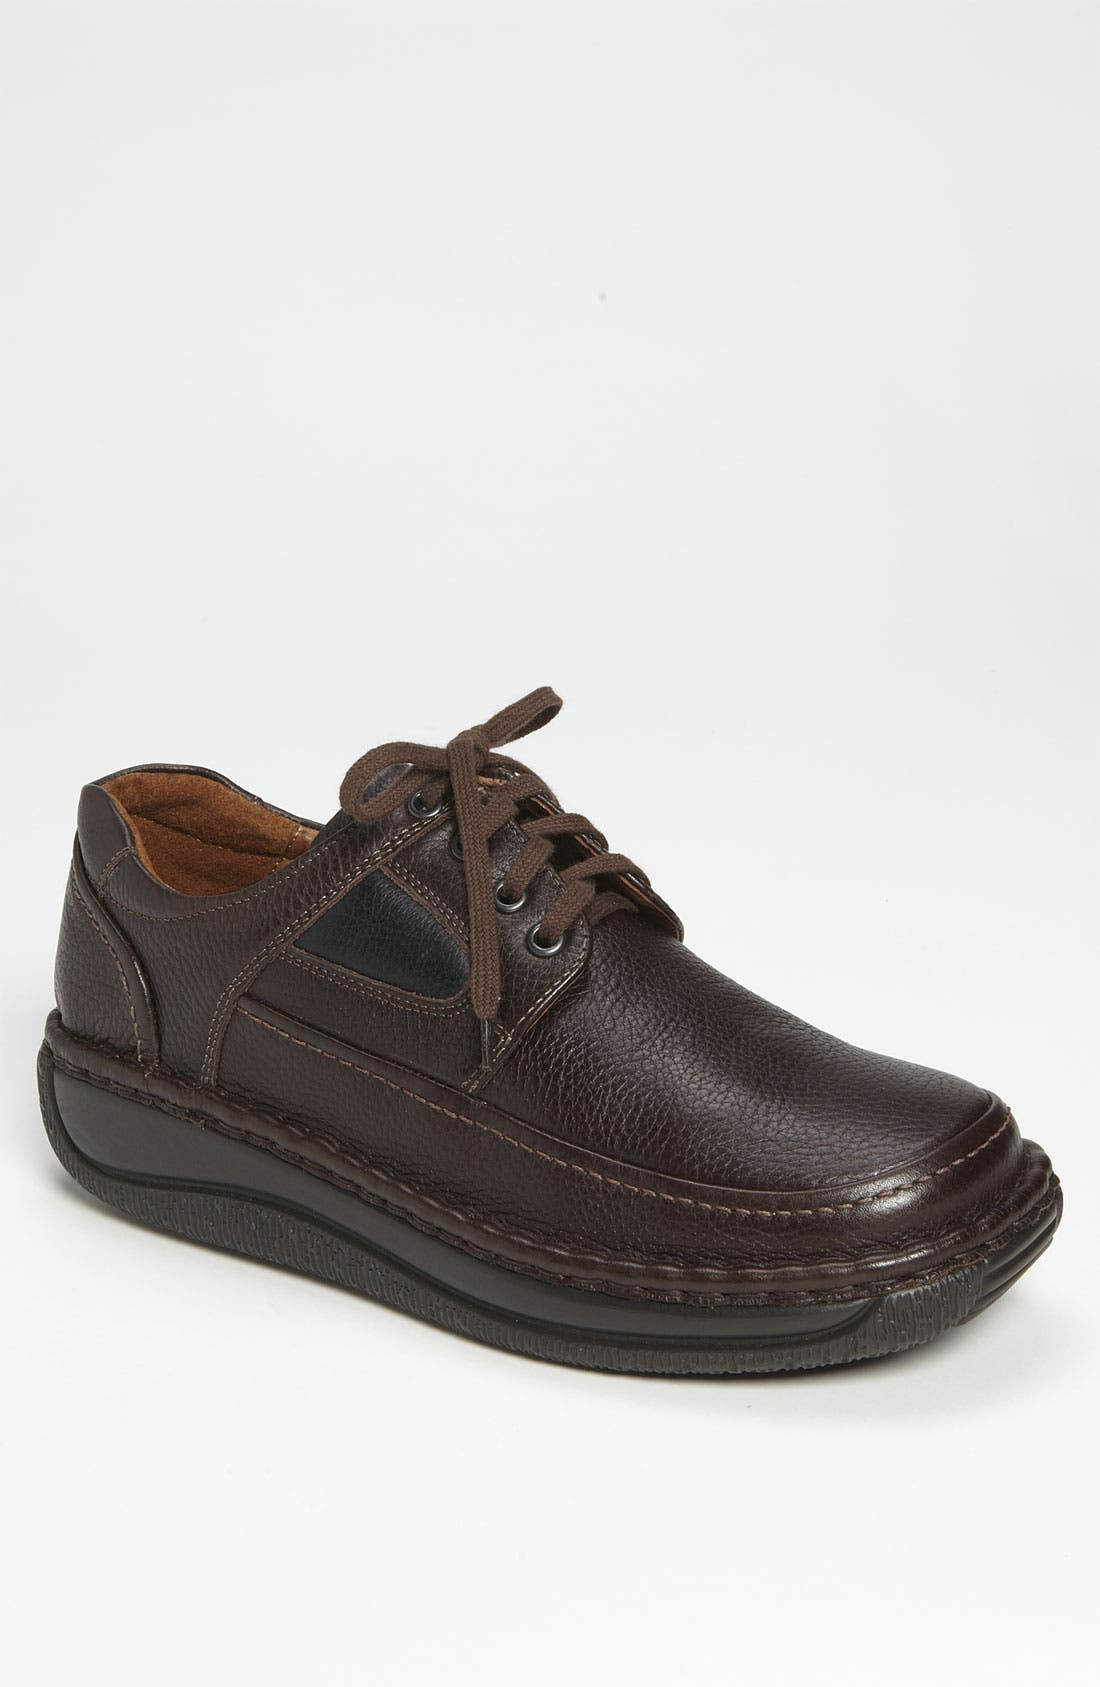 Main Image - Josef Seibel 'Gerald' Moc Toe Sneaker